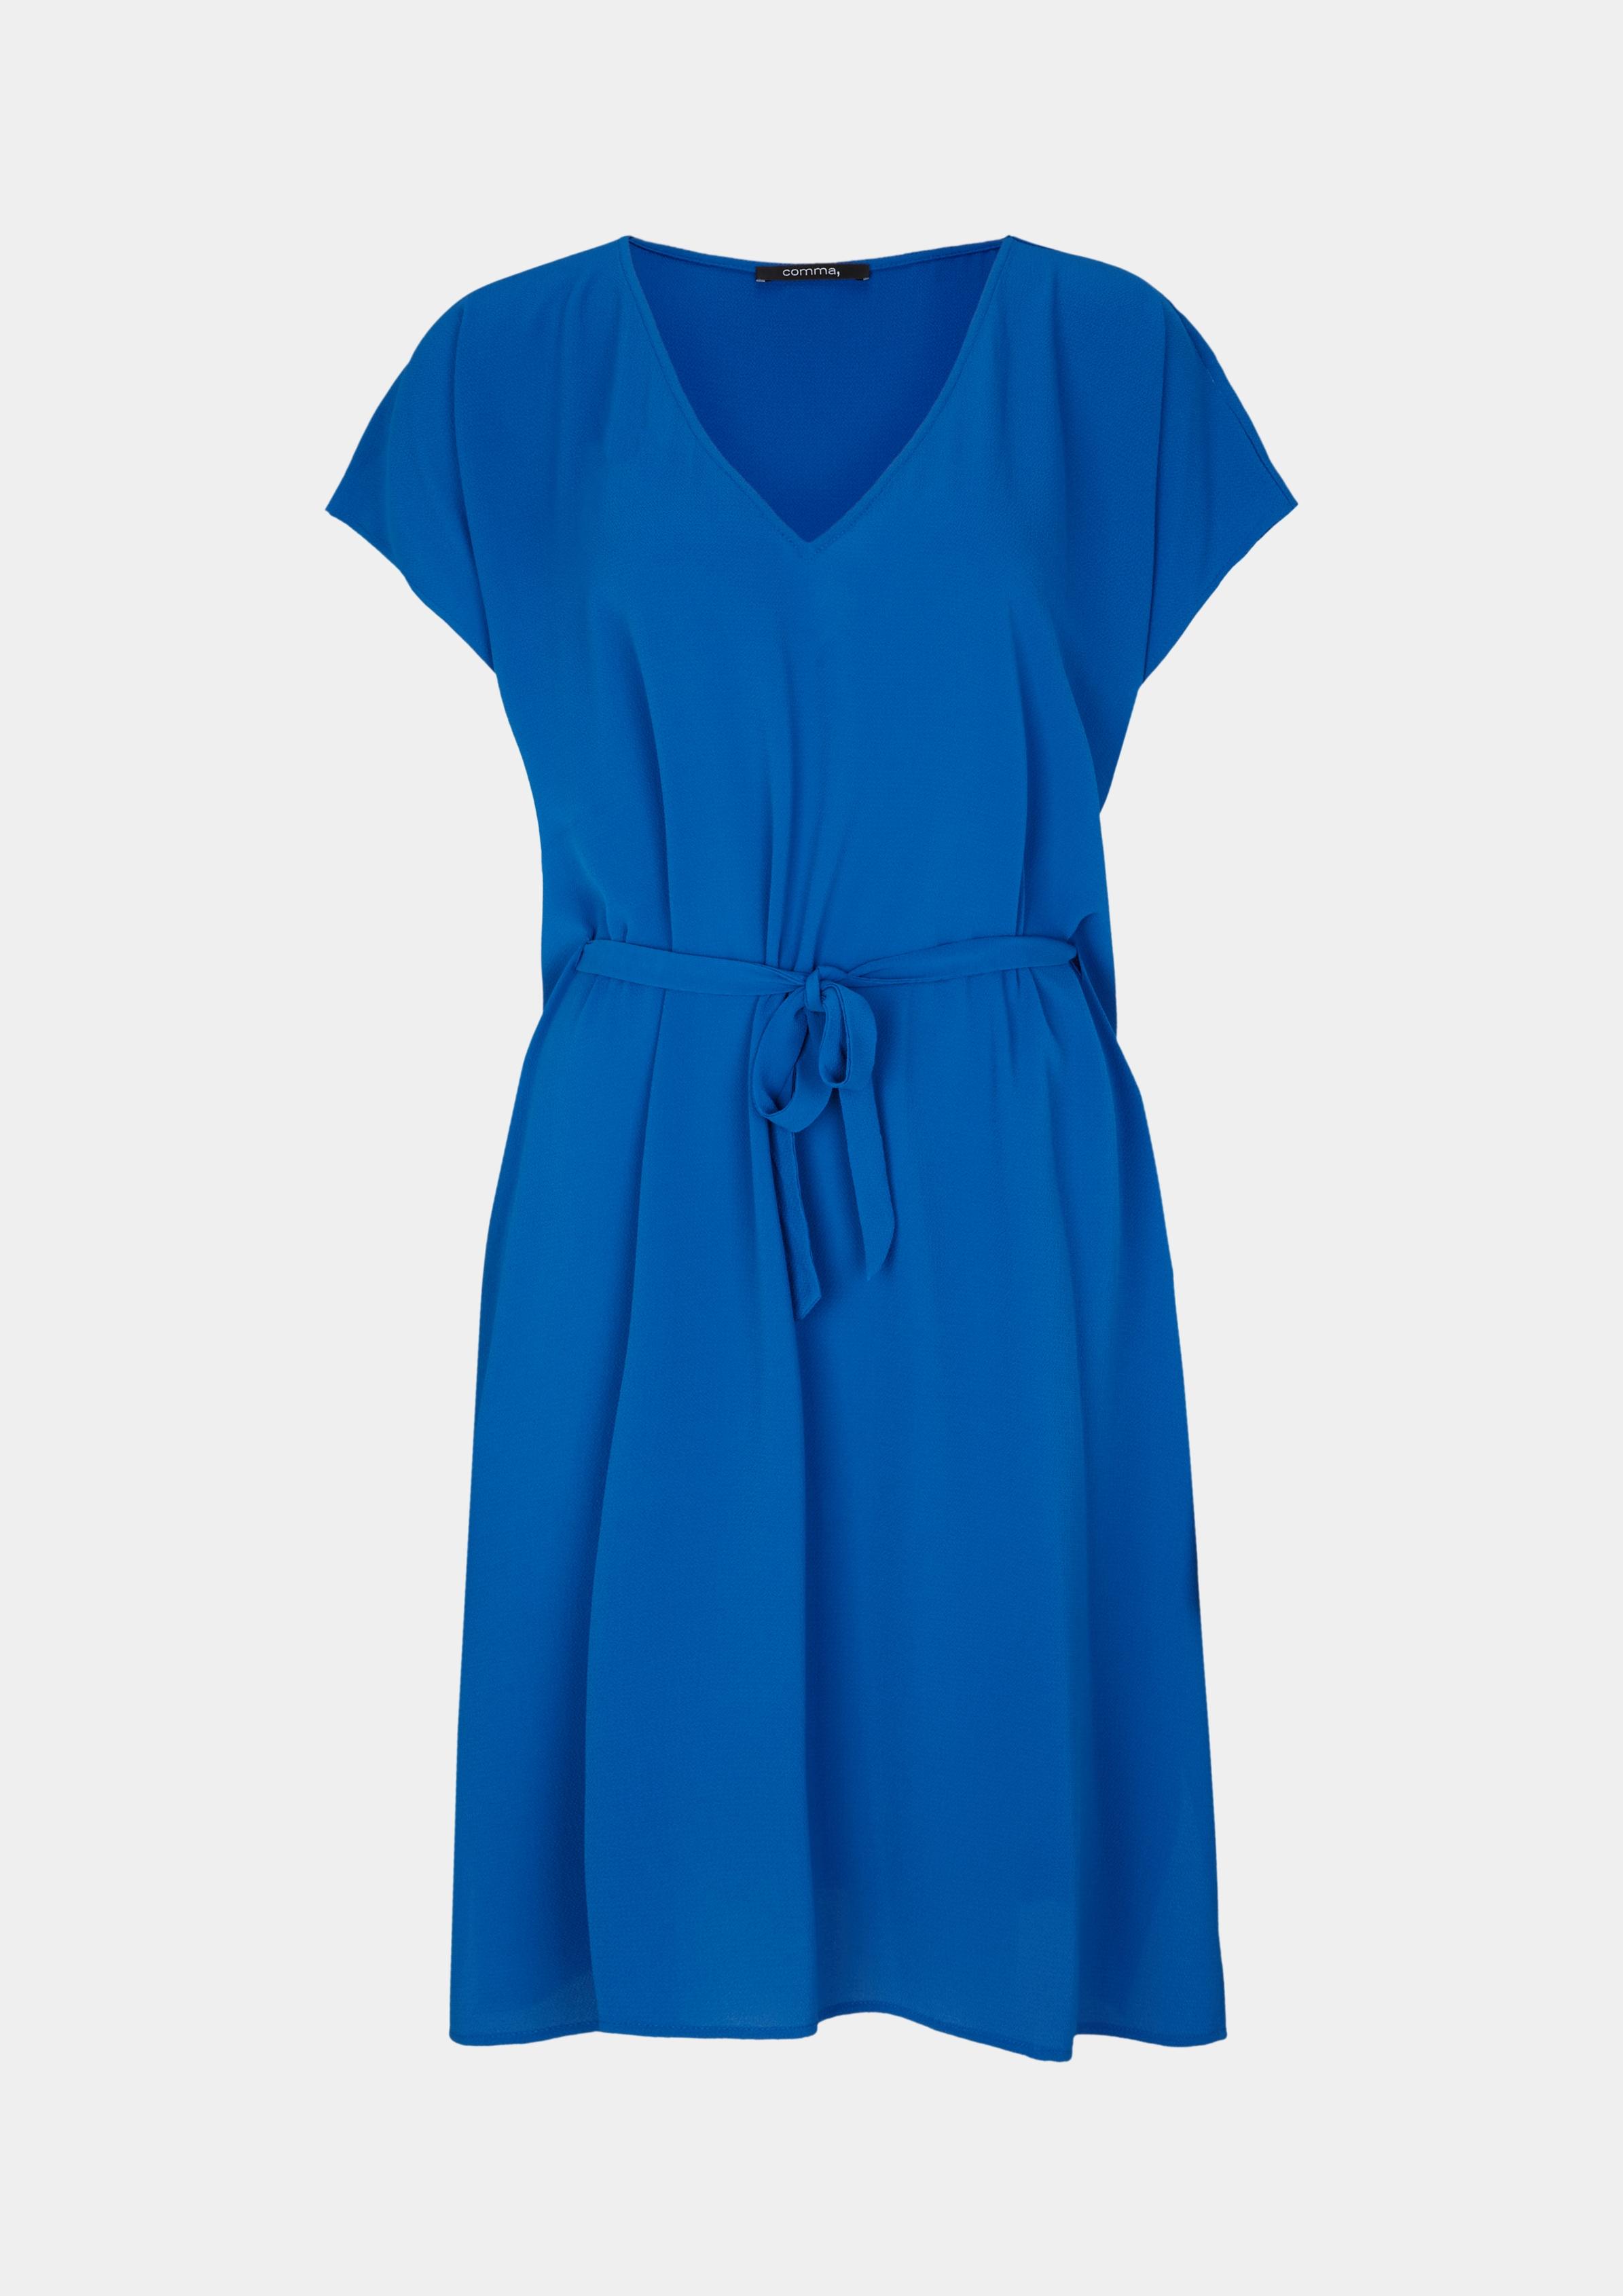 Tunika | Bekleidung > Tuniken > Sonstige Tuniken | Blau | 94% polyester -  6% elasthan | comma